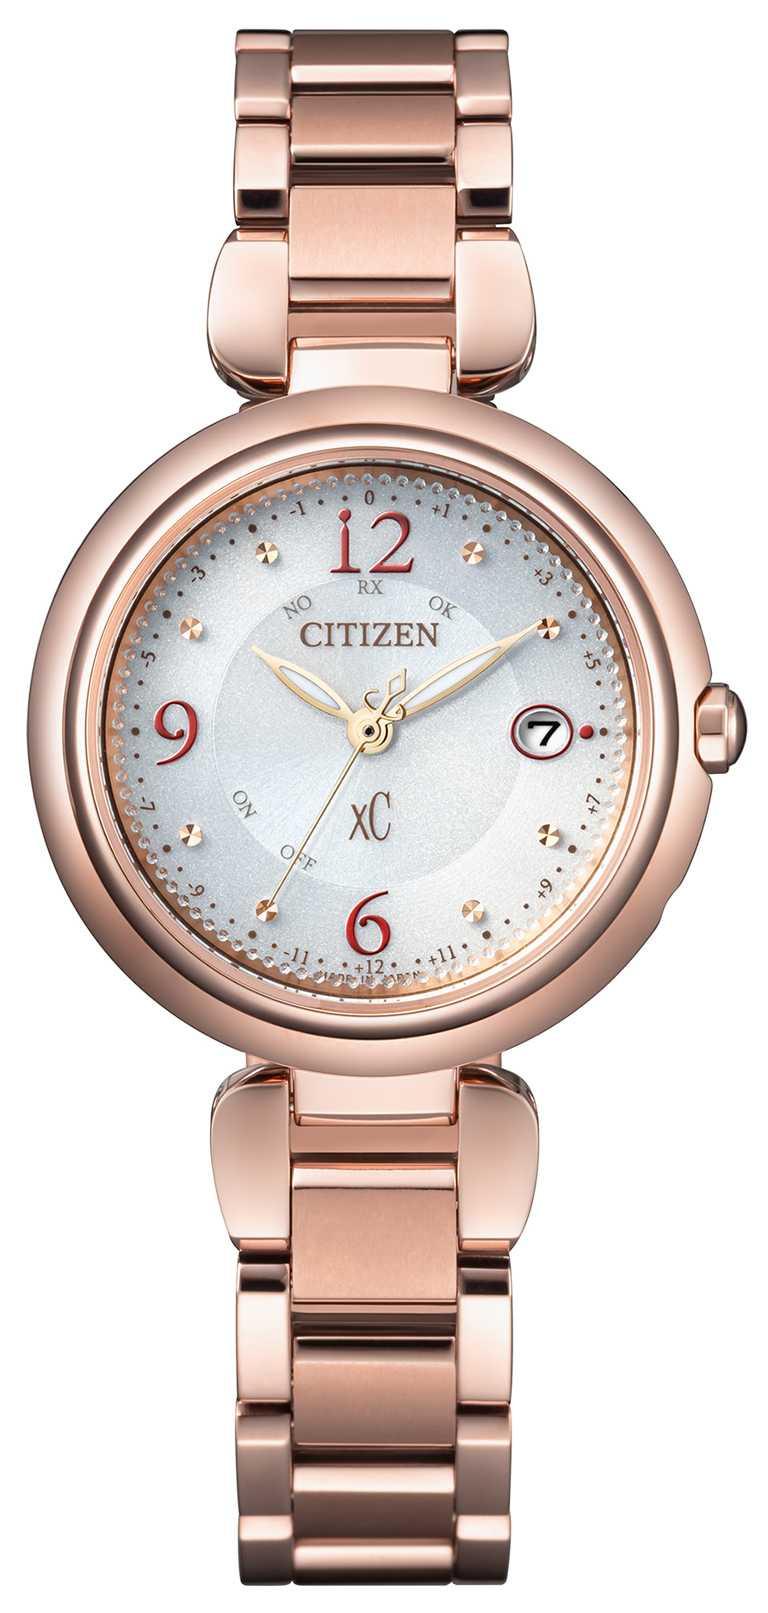 CITIZEN「xC」系列腕錶「水耀光」亞洲限定款,Hebe田馥甄廣告款(型號ES9468-51A)╱鈦金屬、粉紅金錶殼,29mm,29,900元。(圖╱CITIZEN提供)